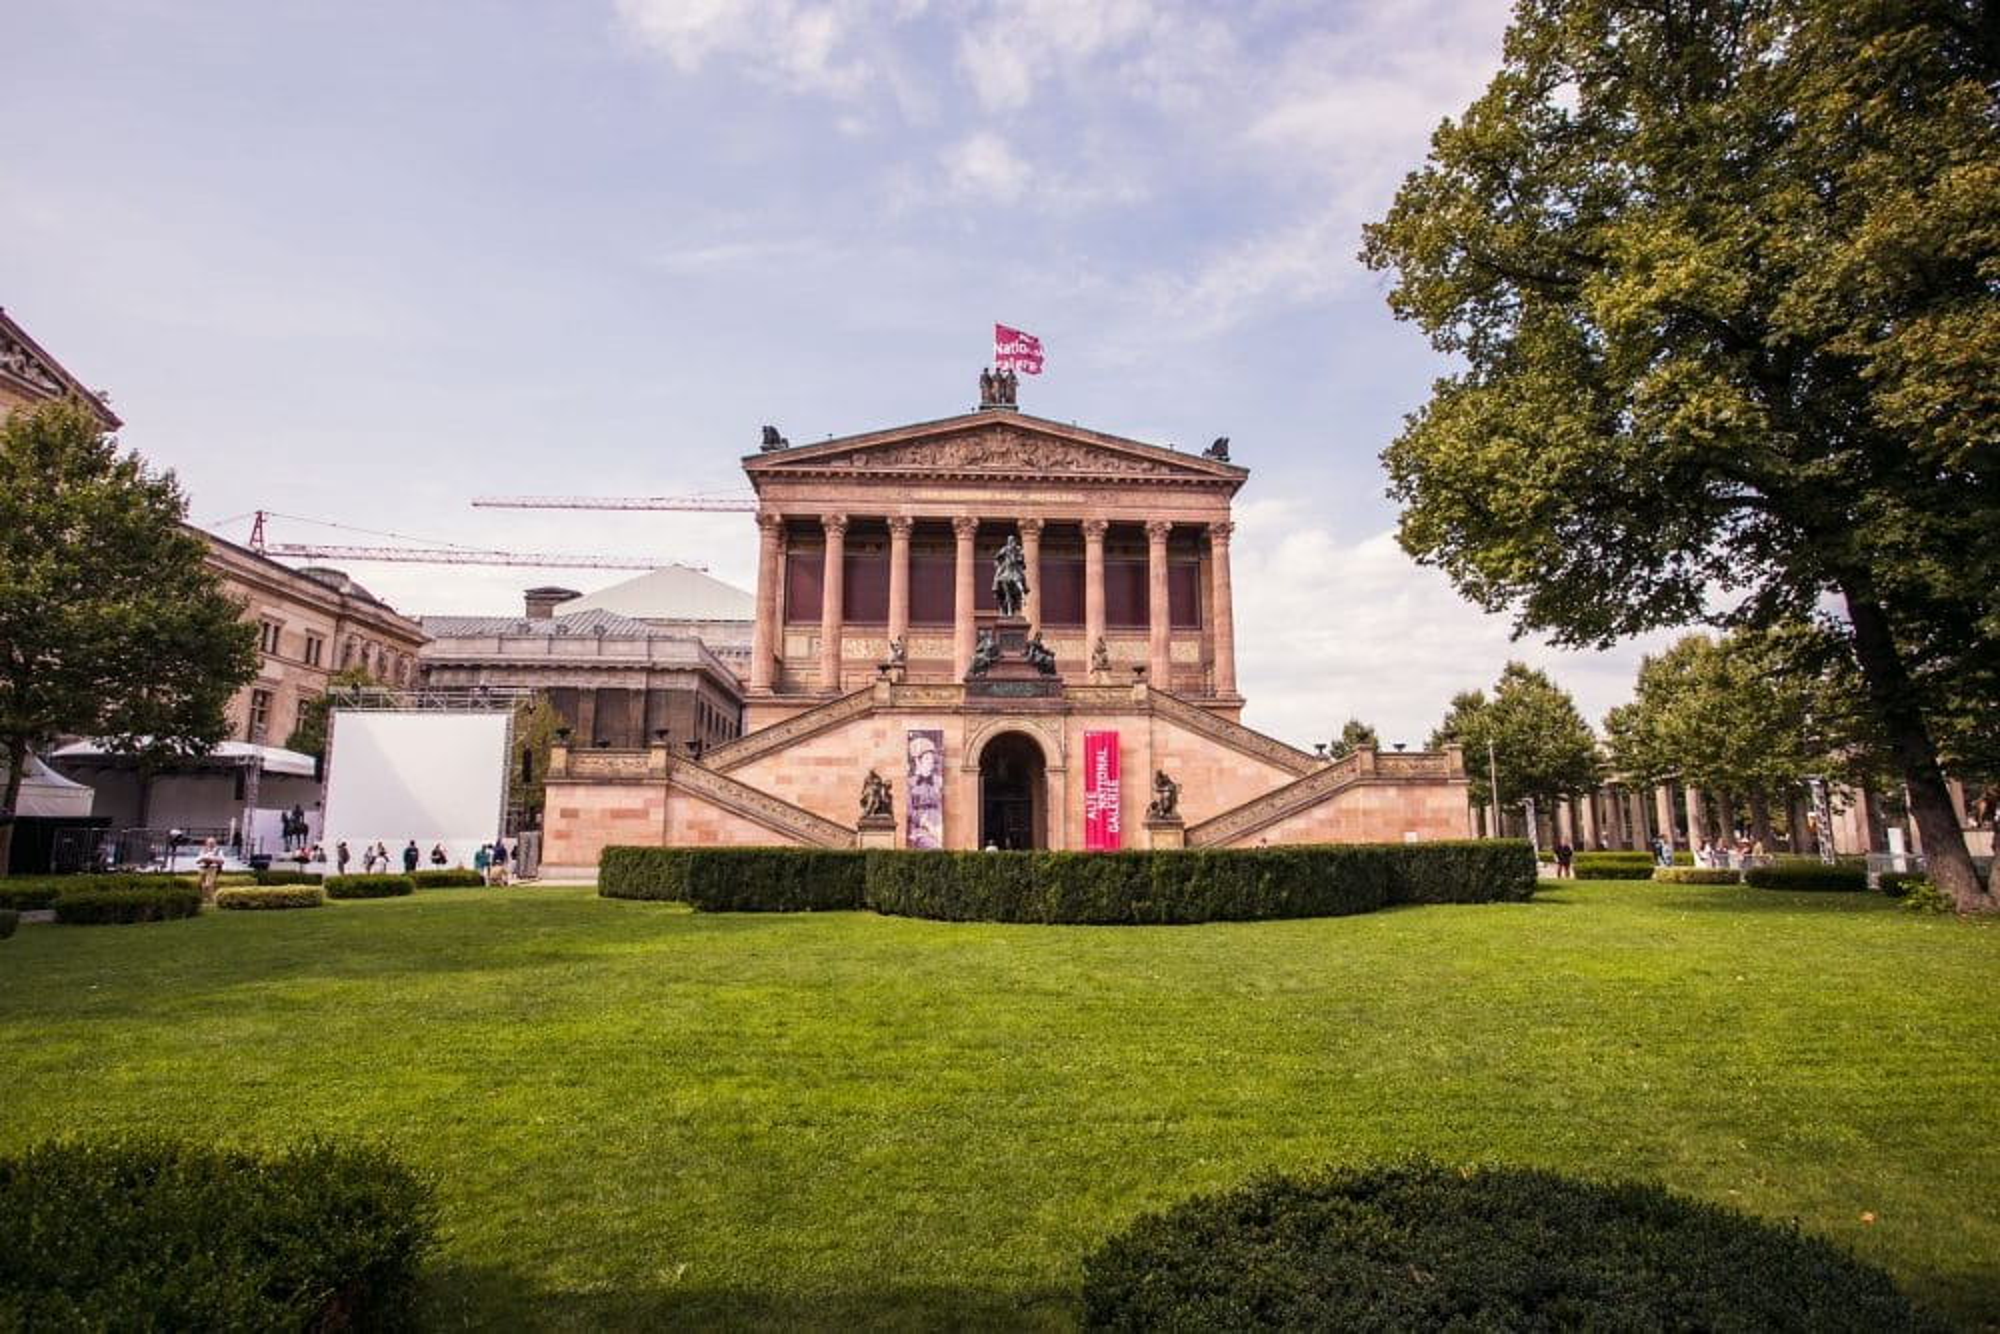 Visiter l'Alte Nationalgalerie à Berlin